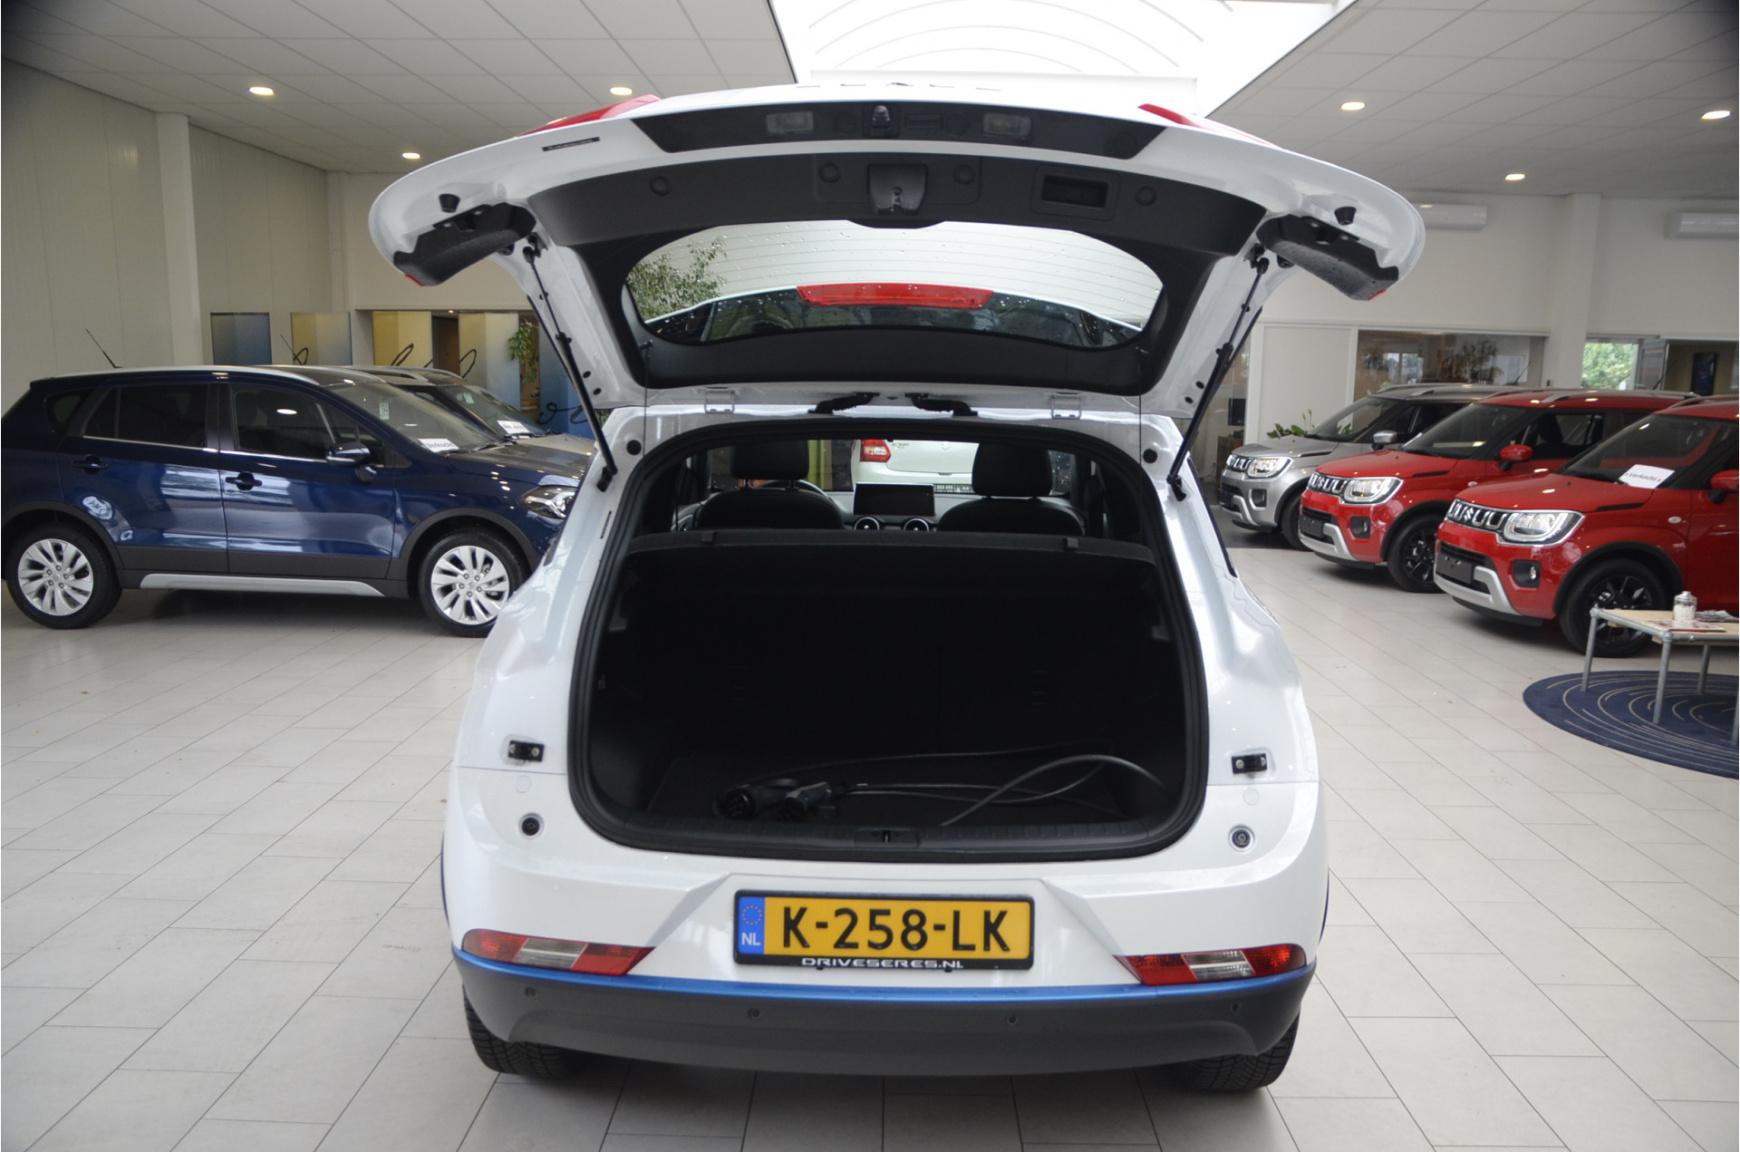 Seres-3 Luxury 52 kWh-37